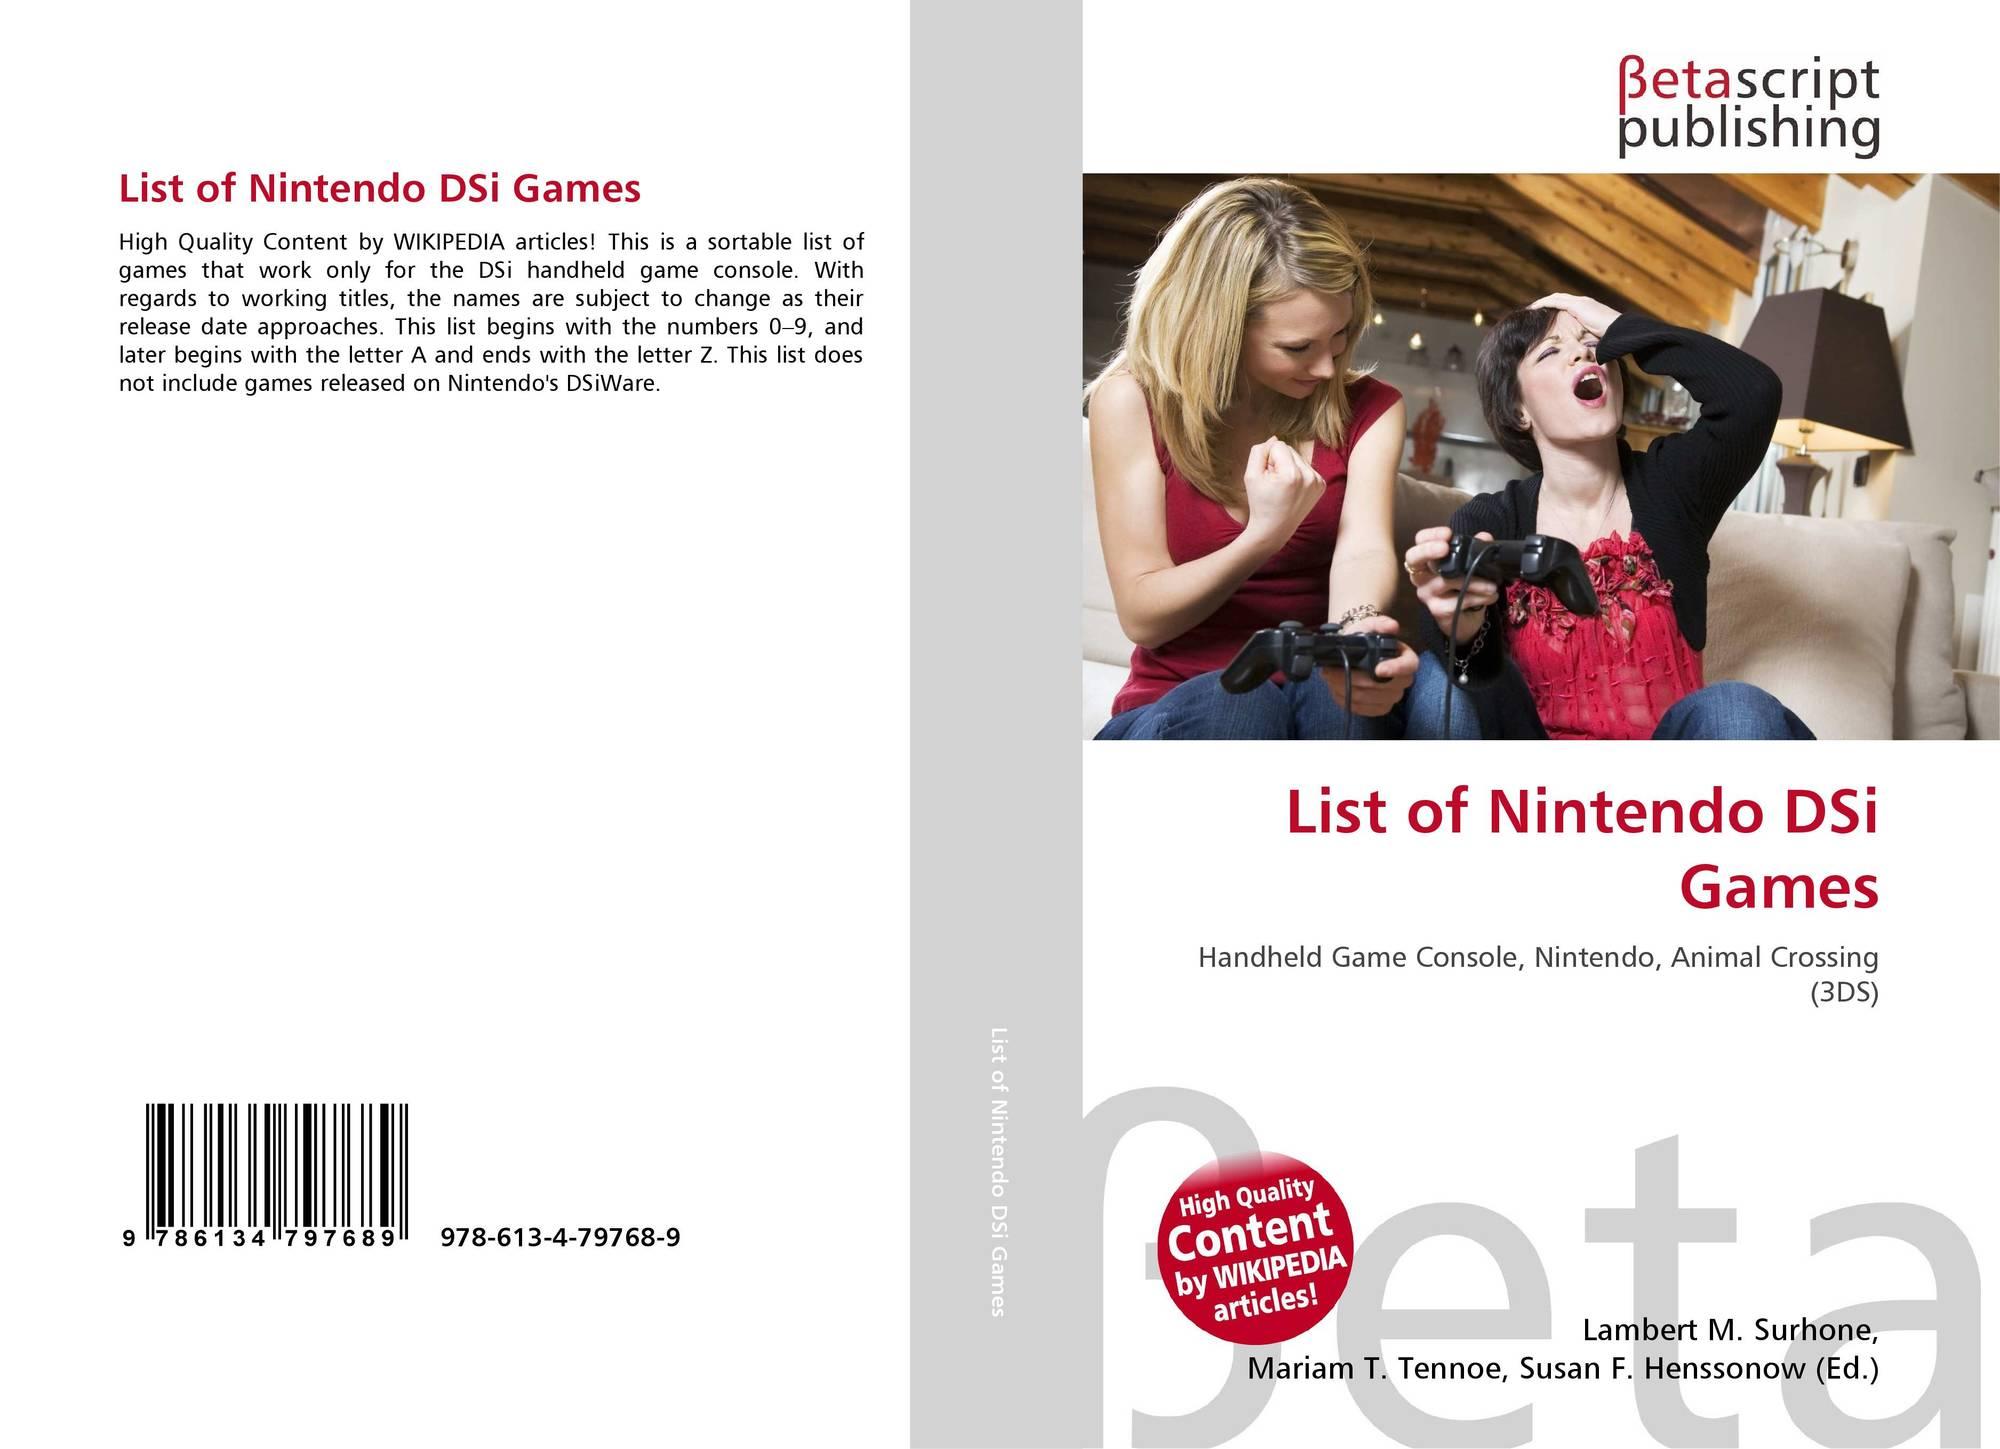 List of Nintendo DSi Games, 978-613-4-79768-9, 6134797685